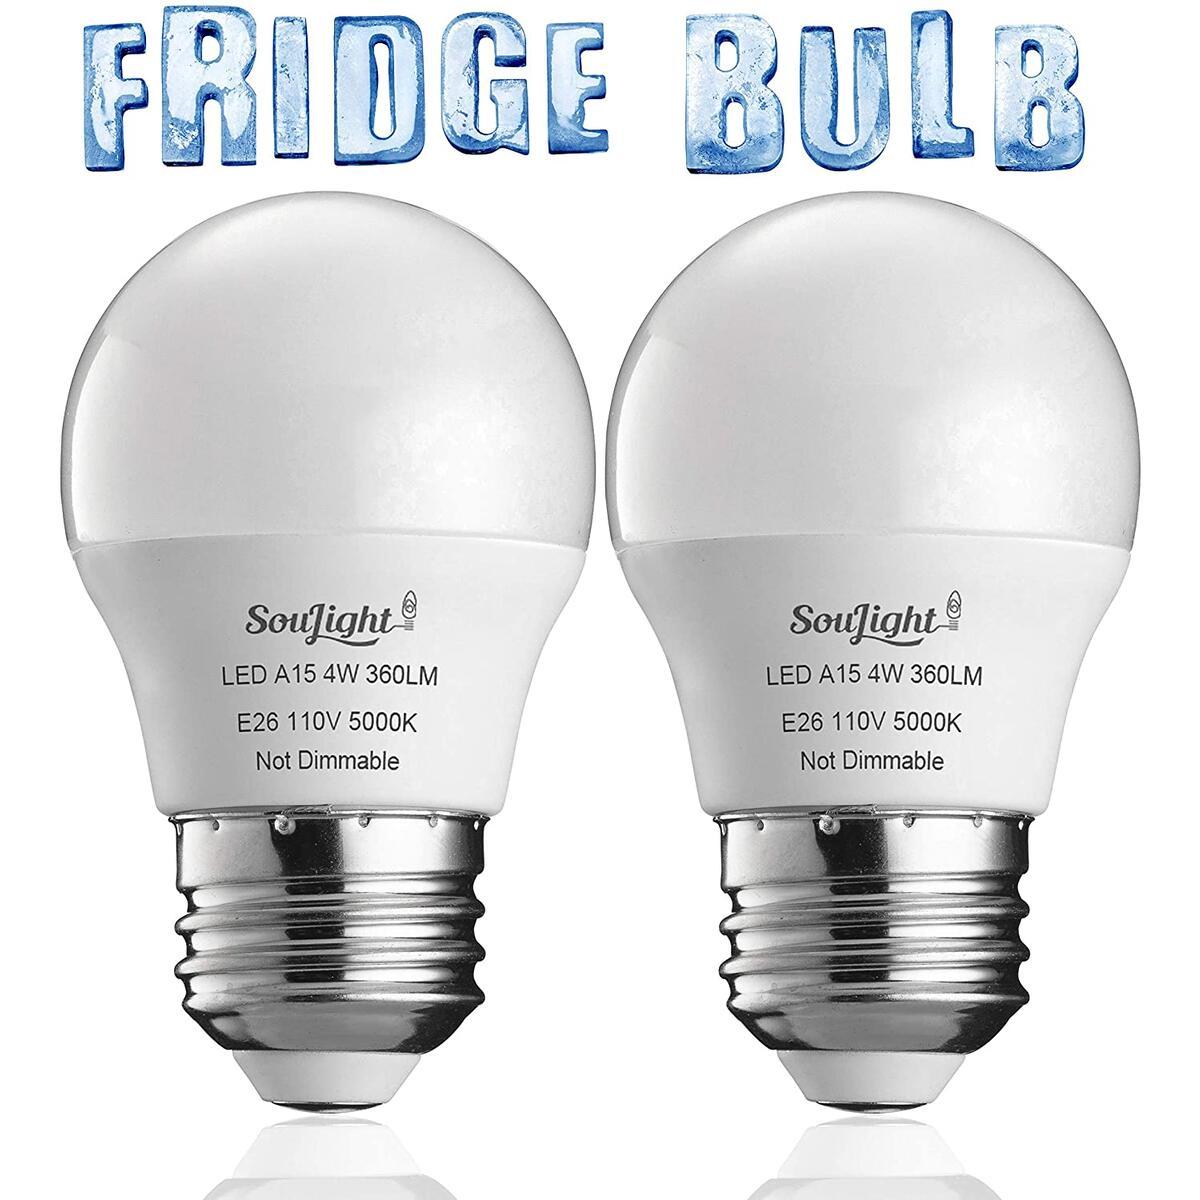 Refrigerator Light Bulb LED - SMD A15 4W 40Watt Equivalent - Waterproof E26 Base - 5000K Daylight White - 360 Lumen - Energy Saving – 40W Led Appliance Bulb - Replacement Bulbs - 2 Pack.